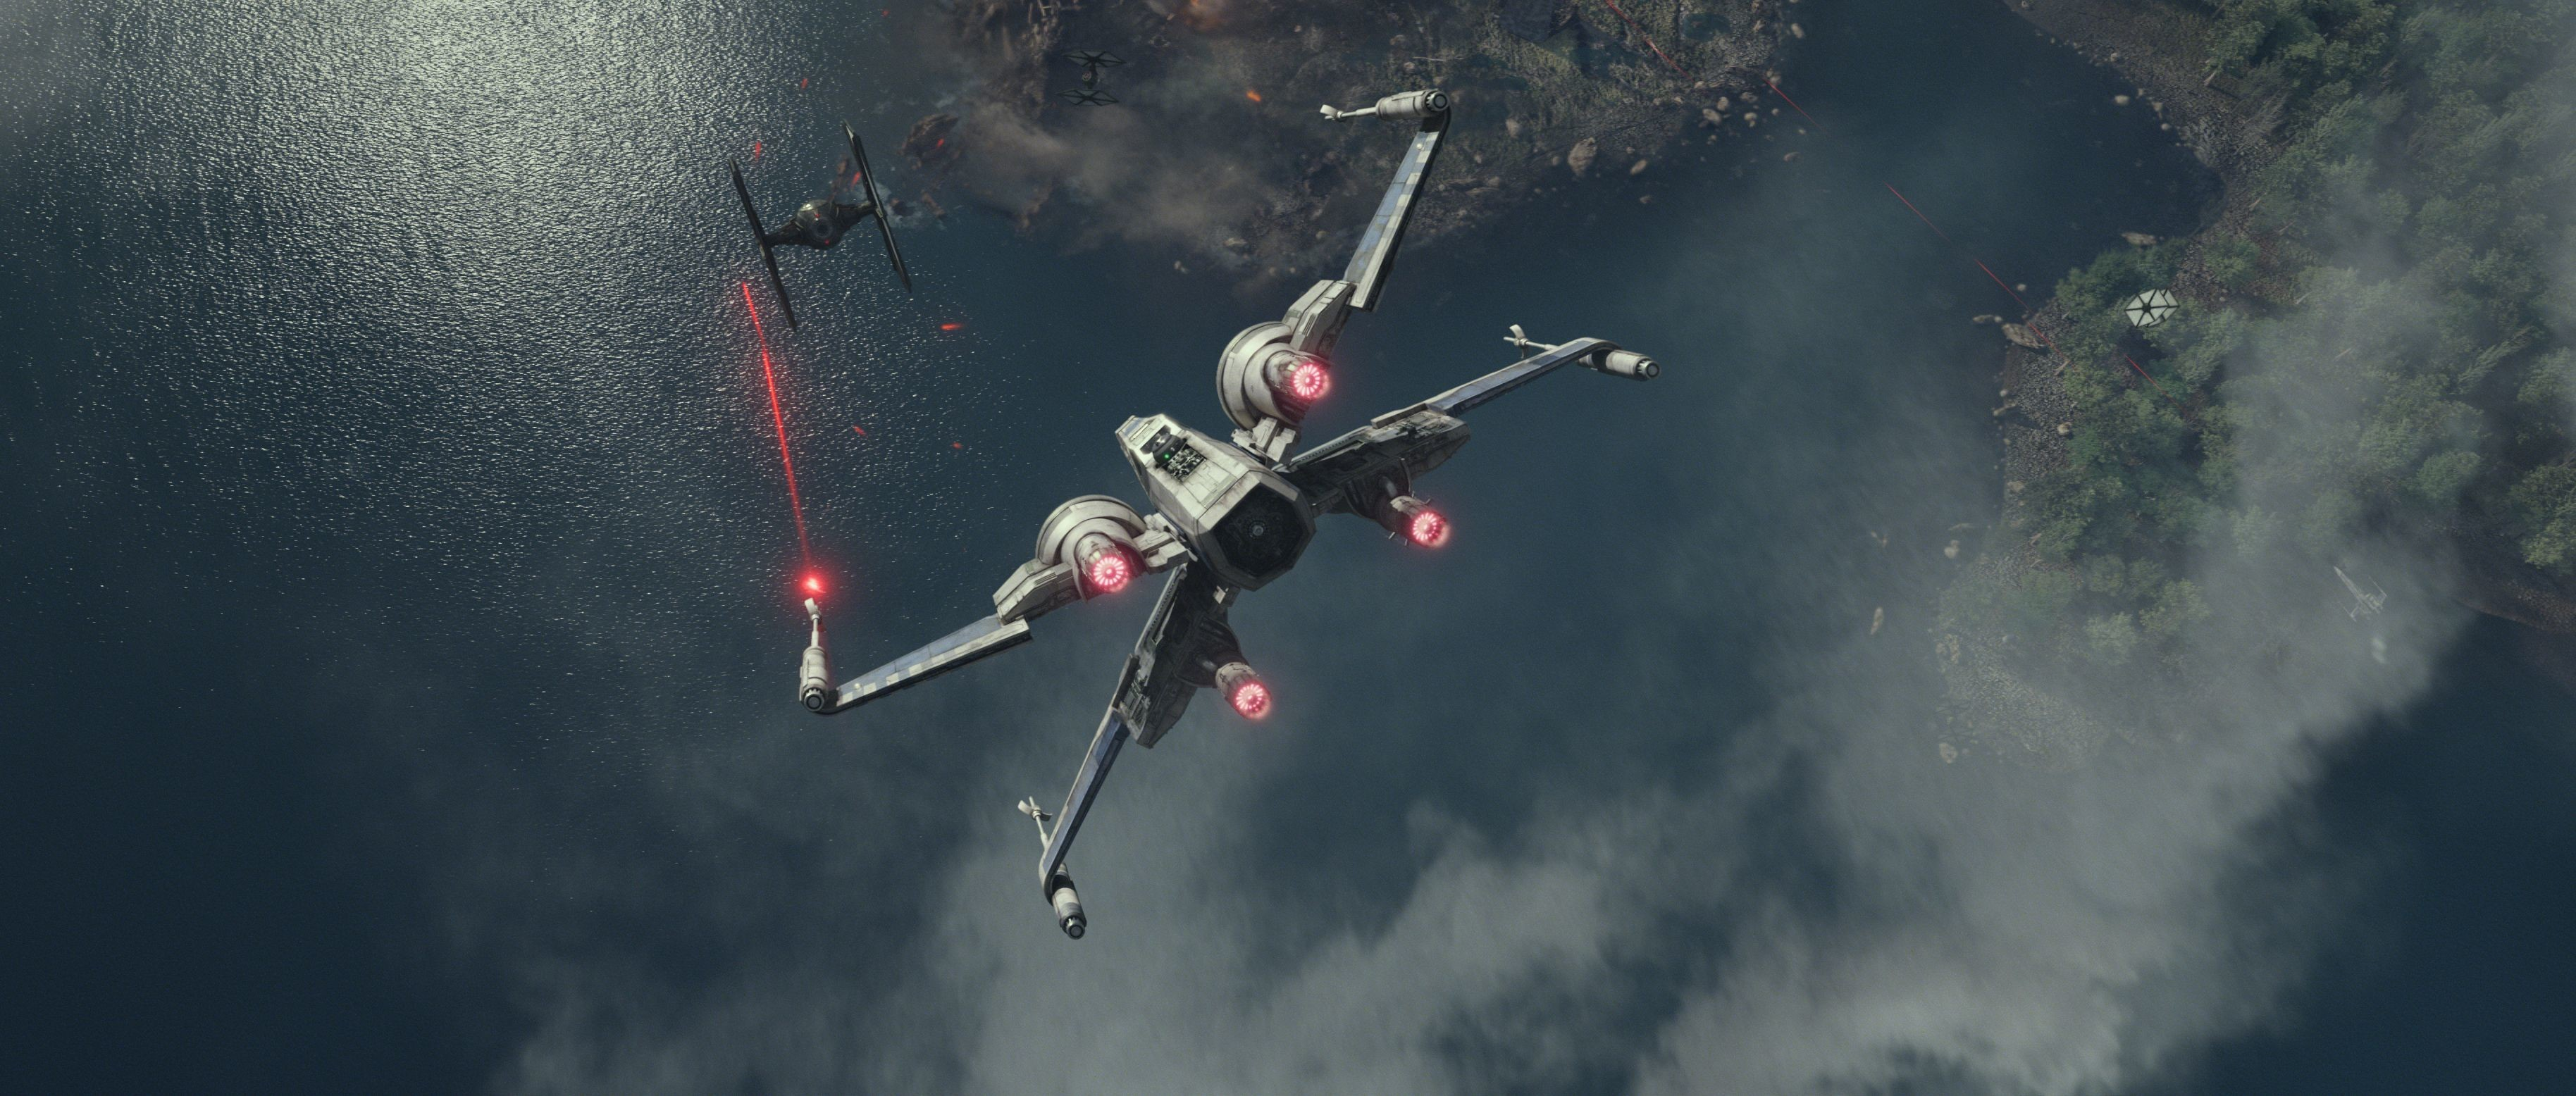 … Star Wars Wallpaper (19) …